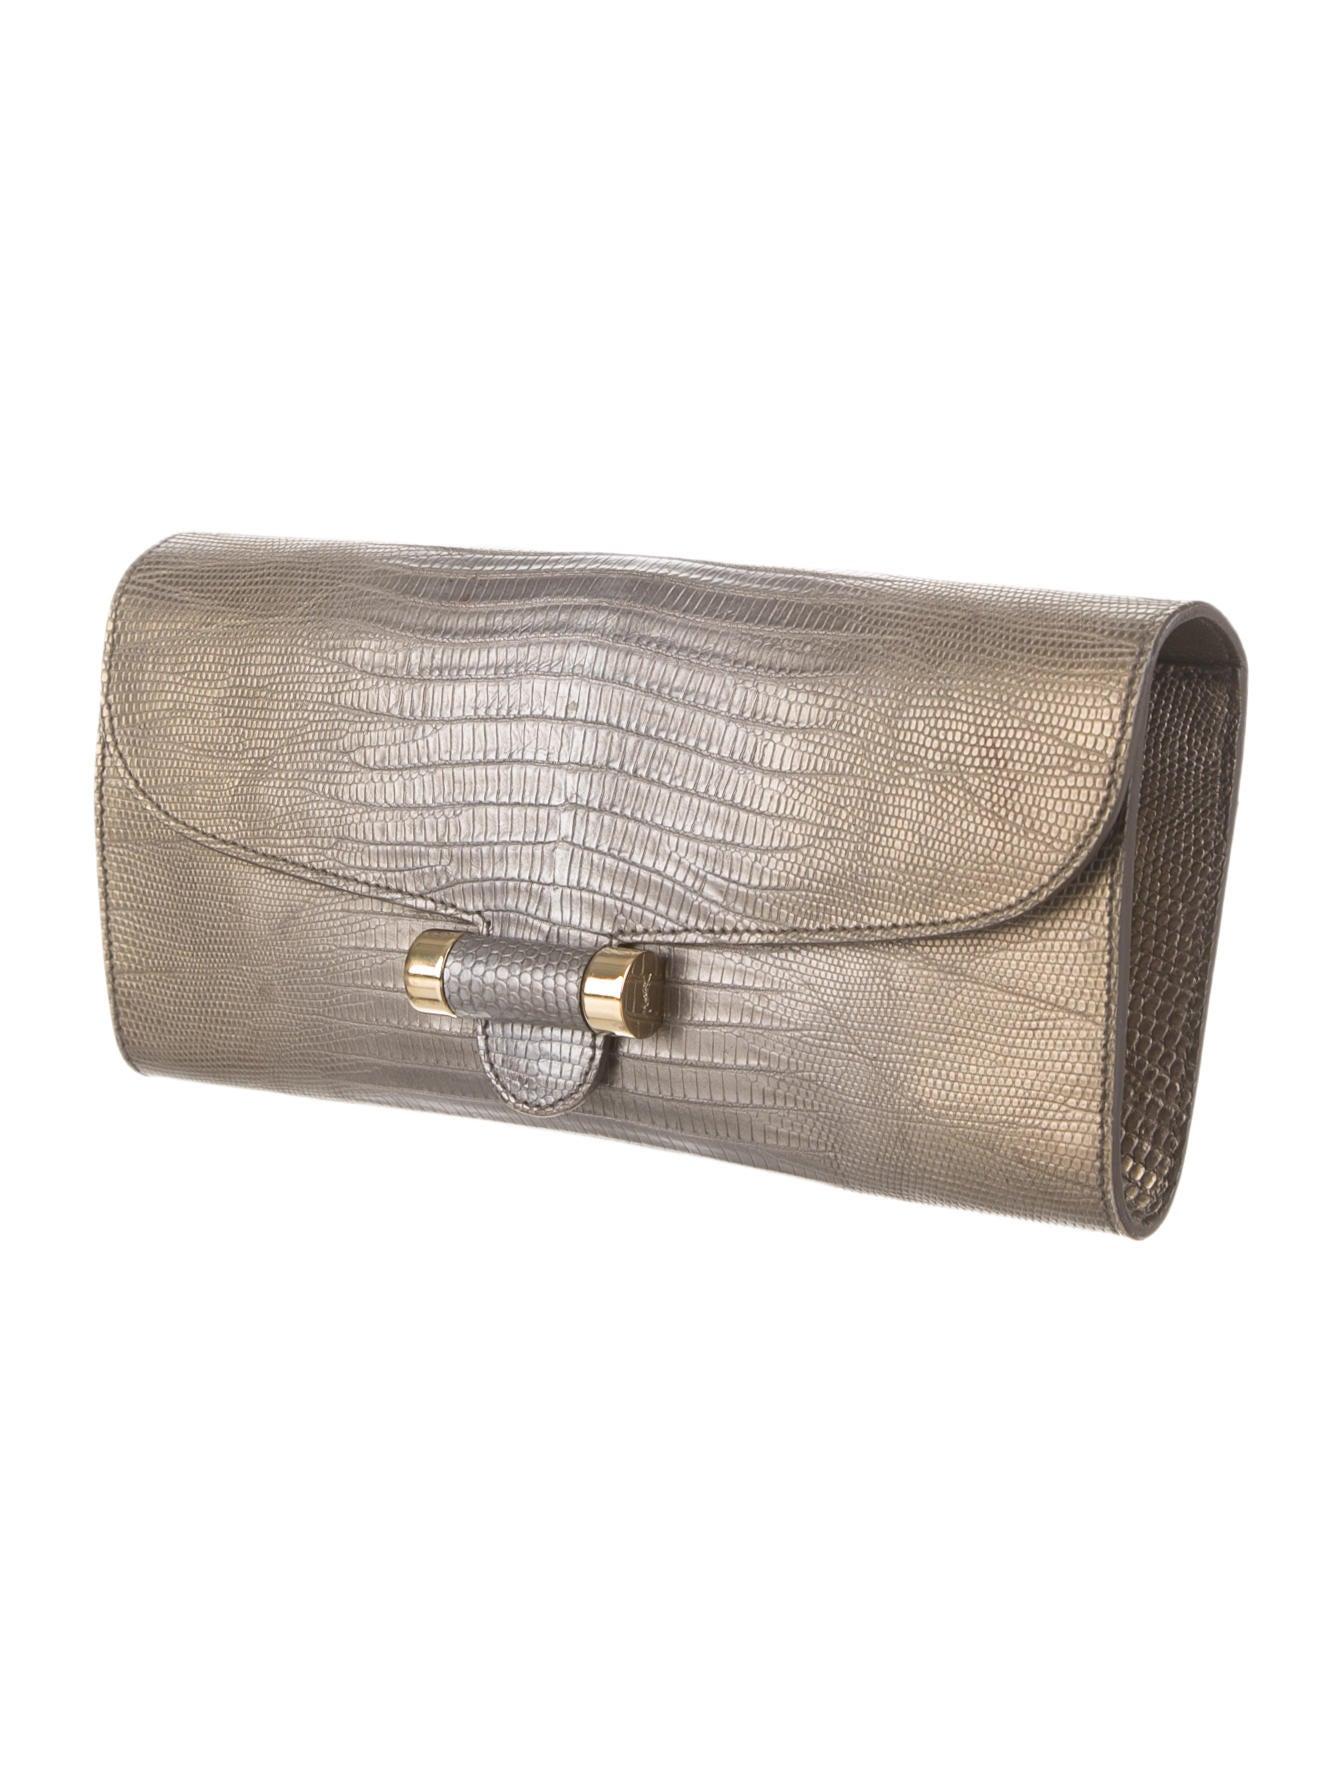 Yves Saint Laurent Lizard Clutch - Handbags - YVE32592 | The RealReal